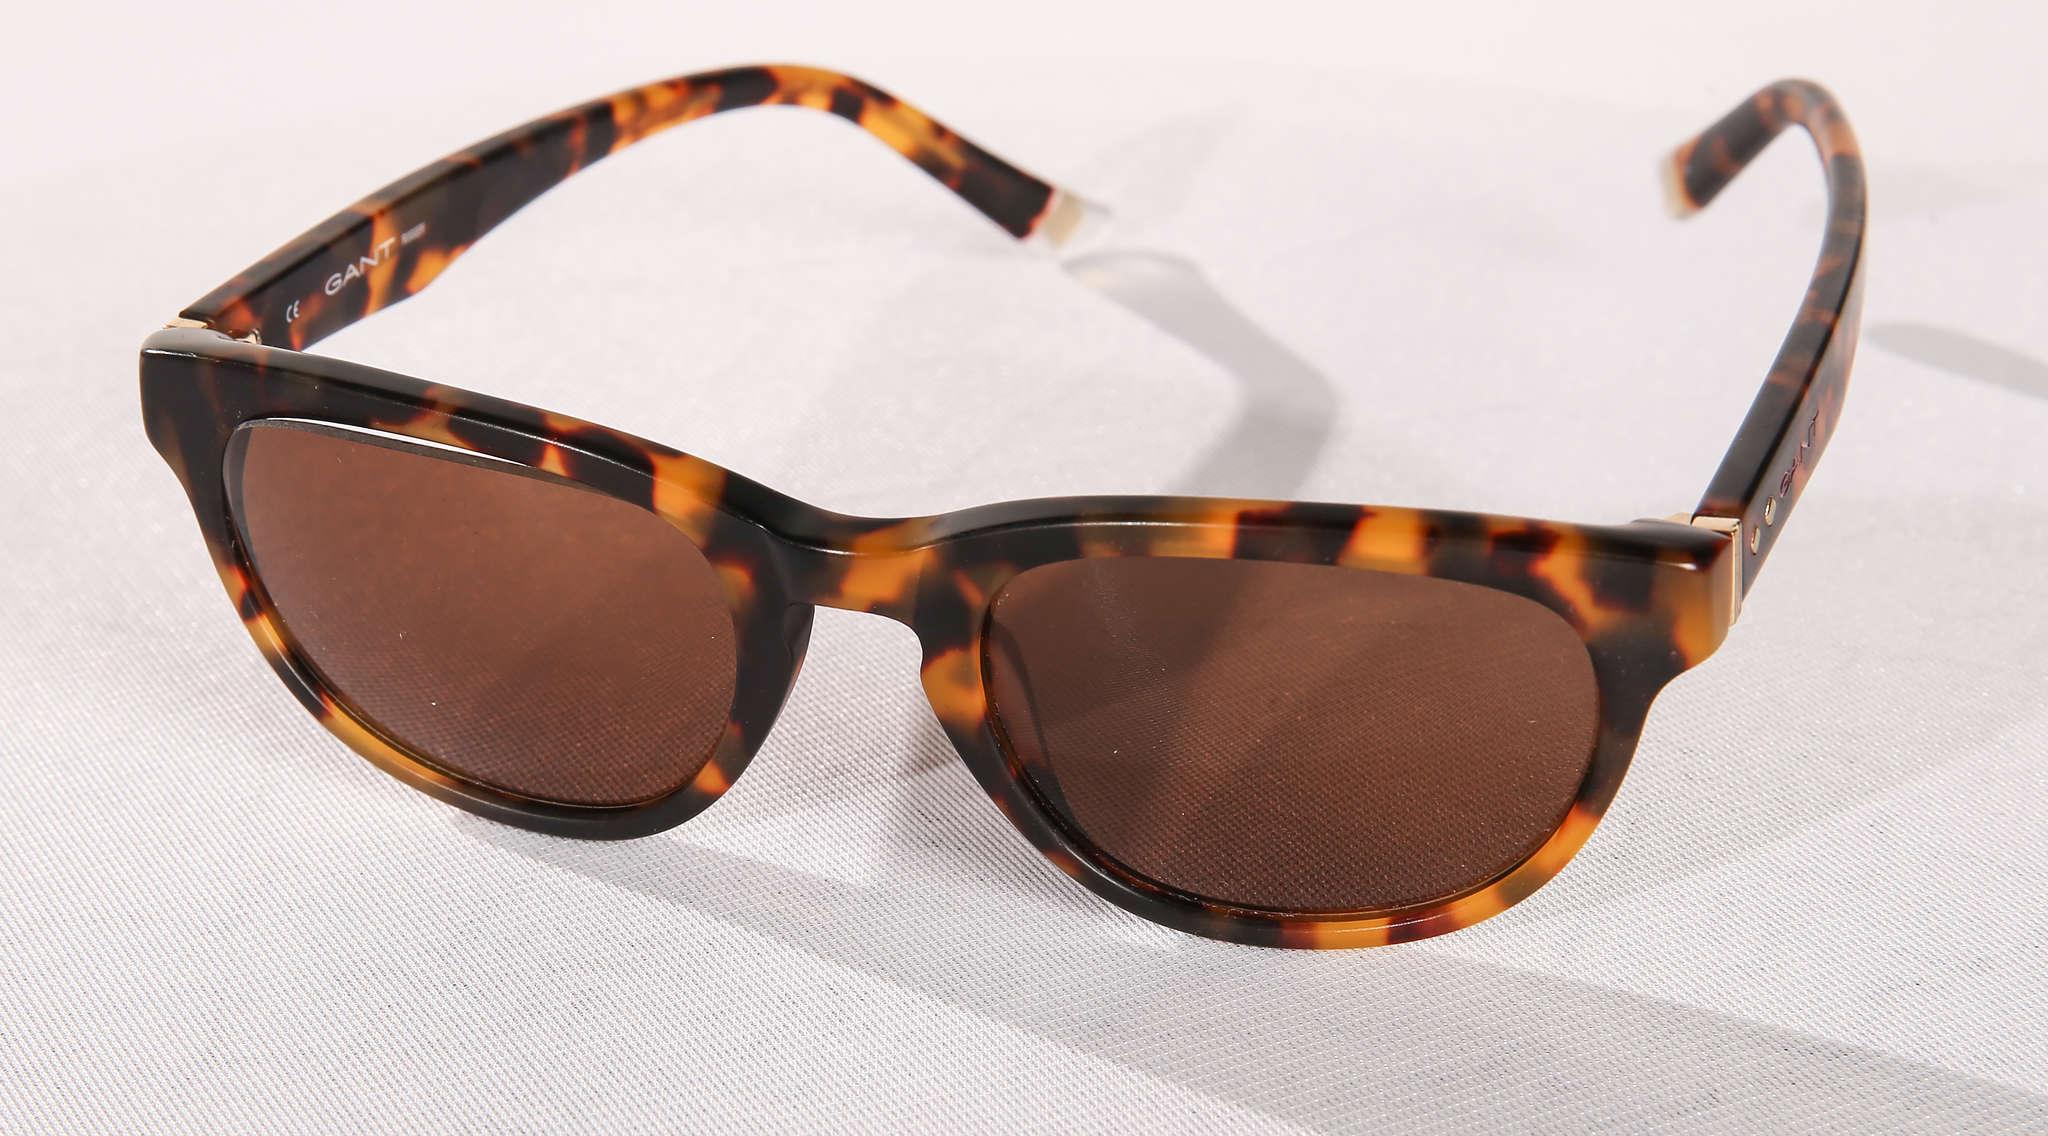 Kate Spade New York tortoiseshell sunglasses, $250.